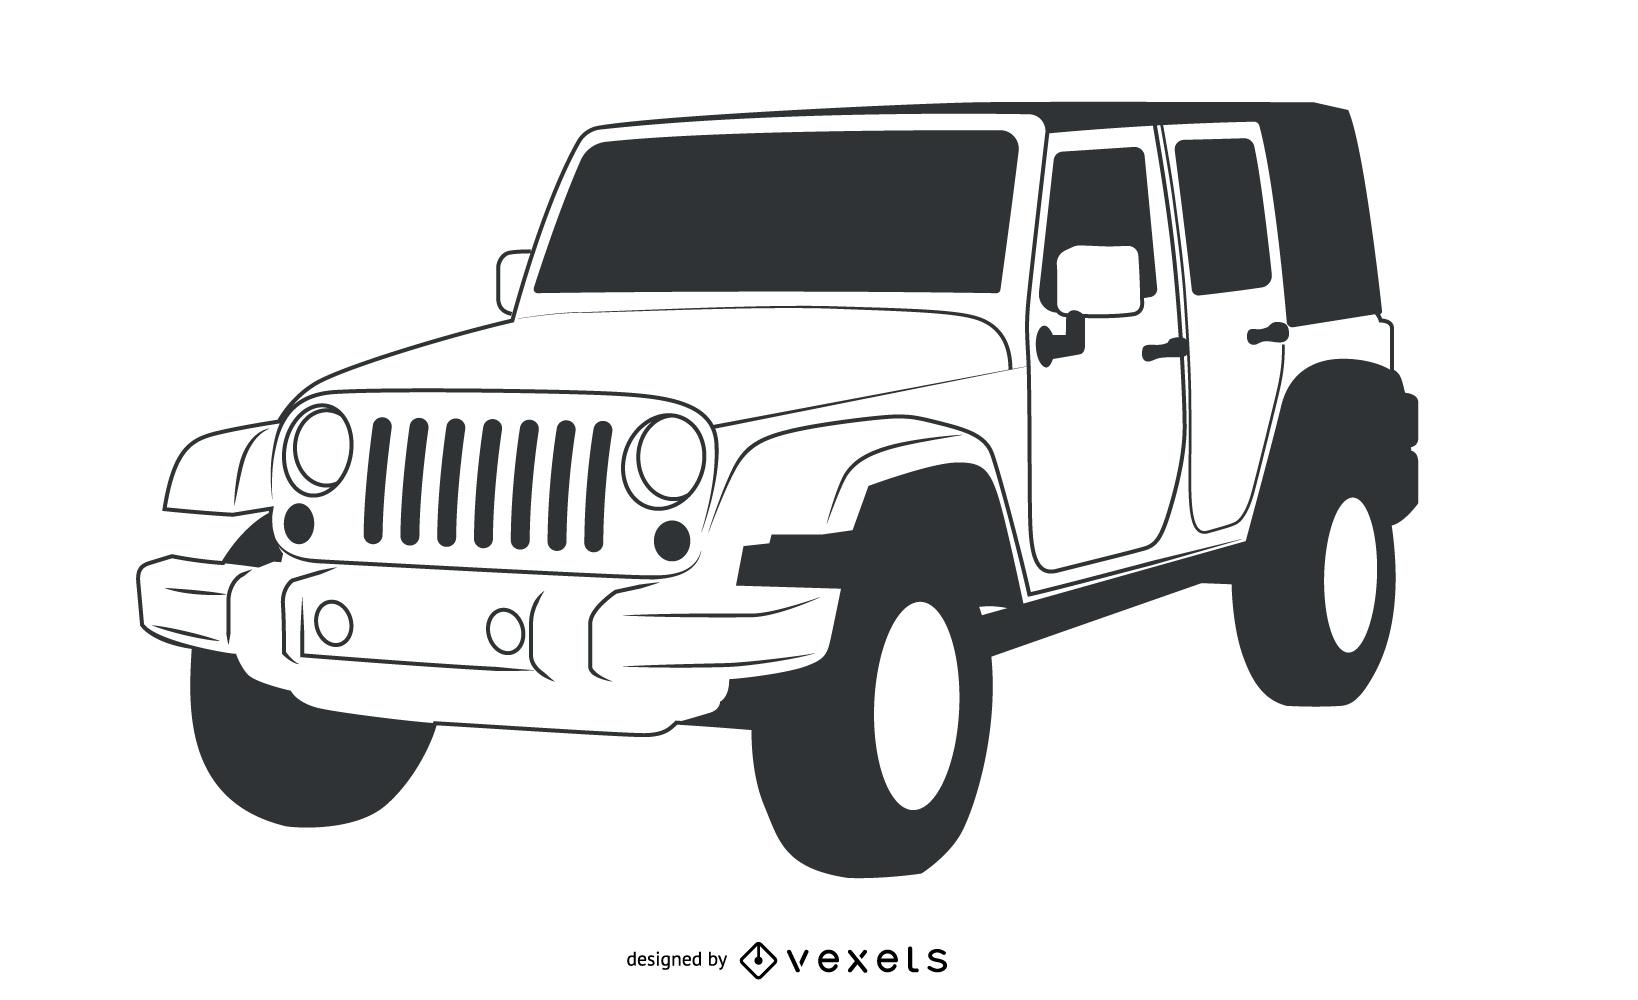 Mao De Traco Preto E Branco Jeep Wrangler